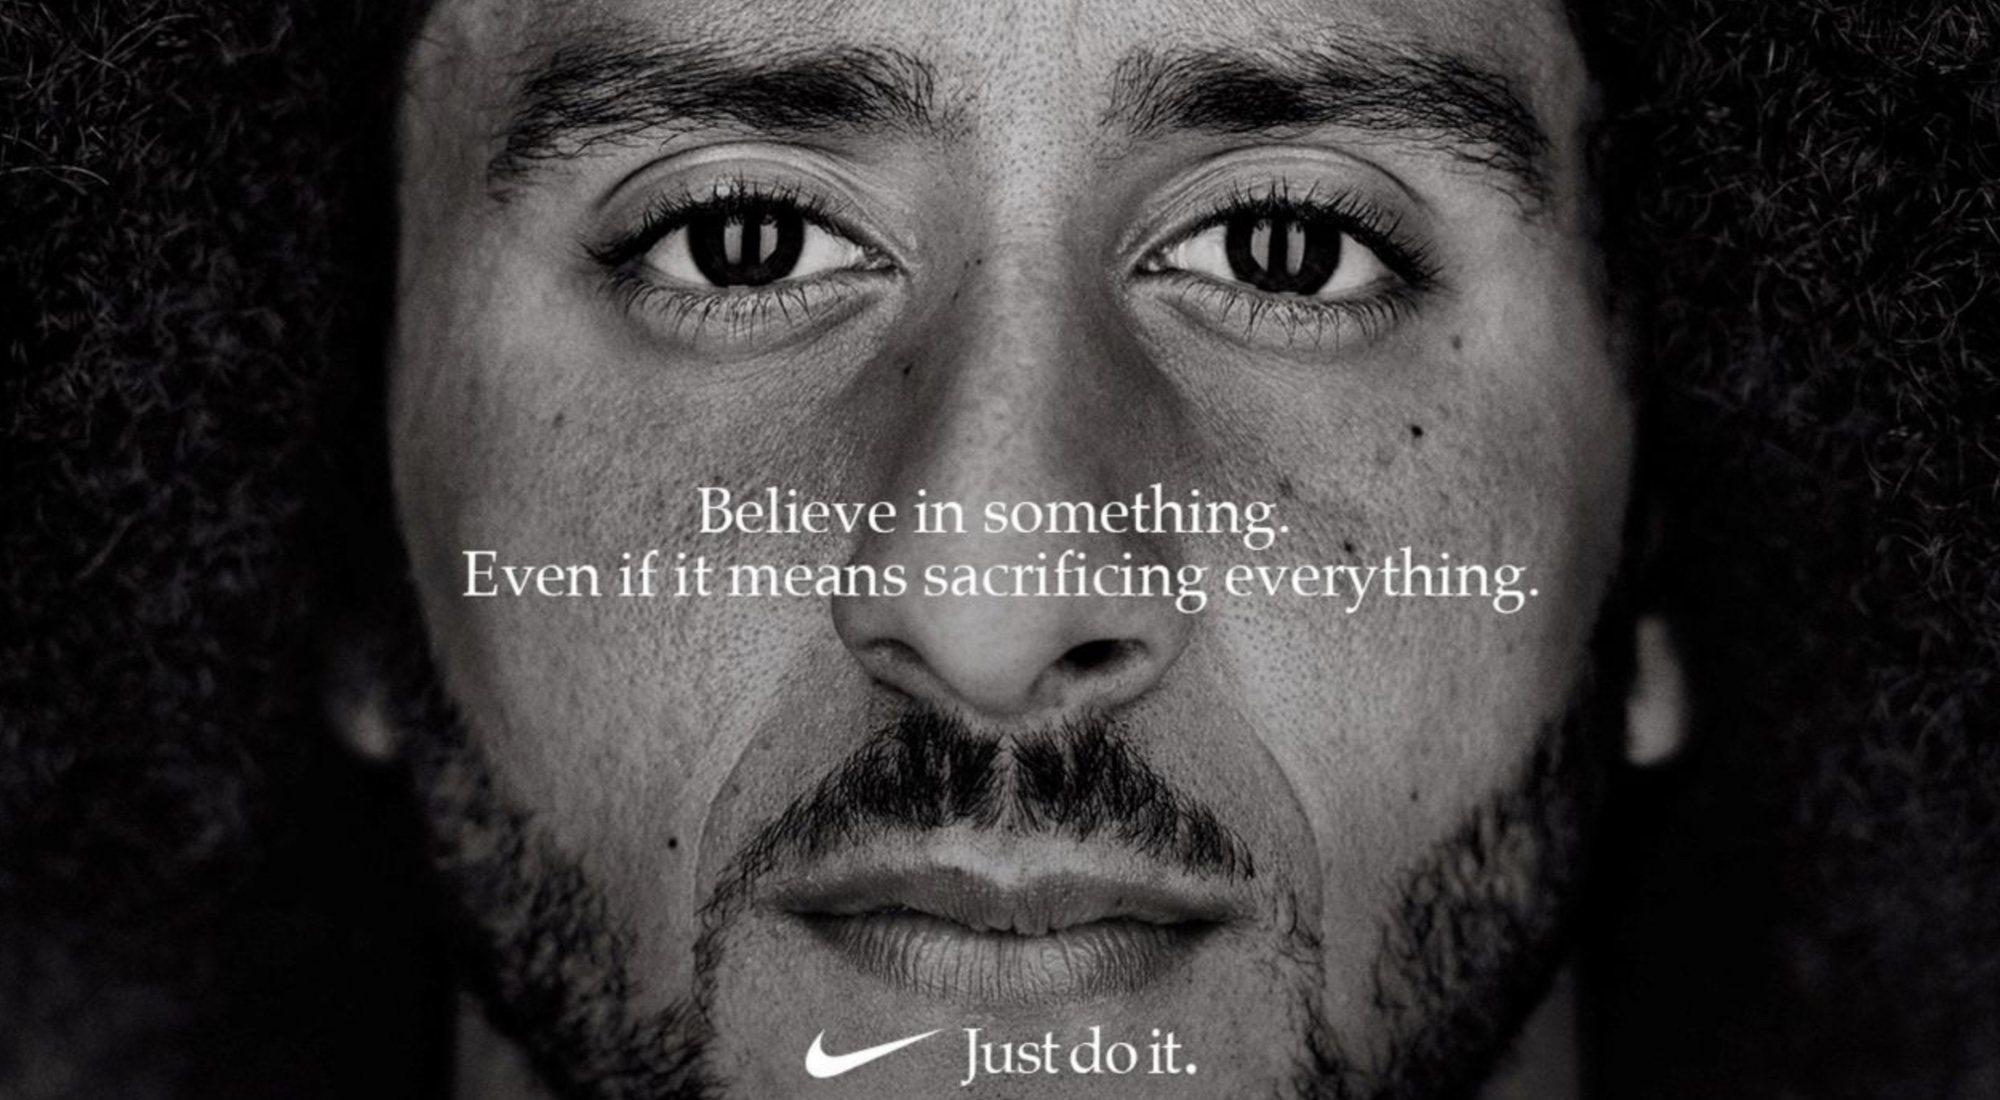 La controvertida campaña de Nike con Colin Kaepernick, explicada